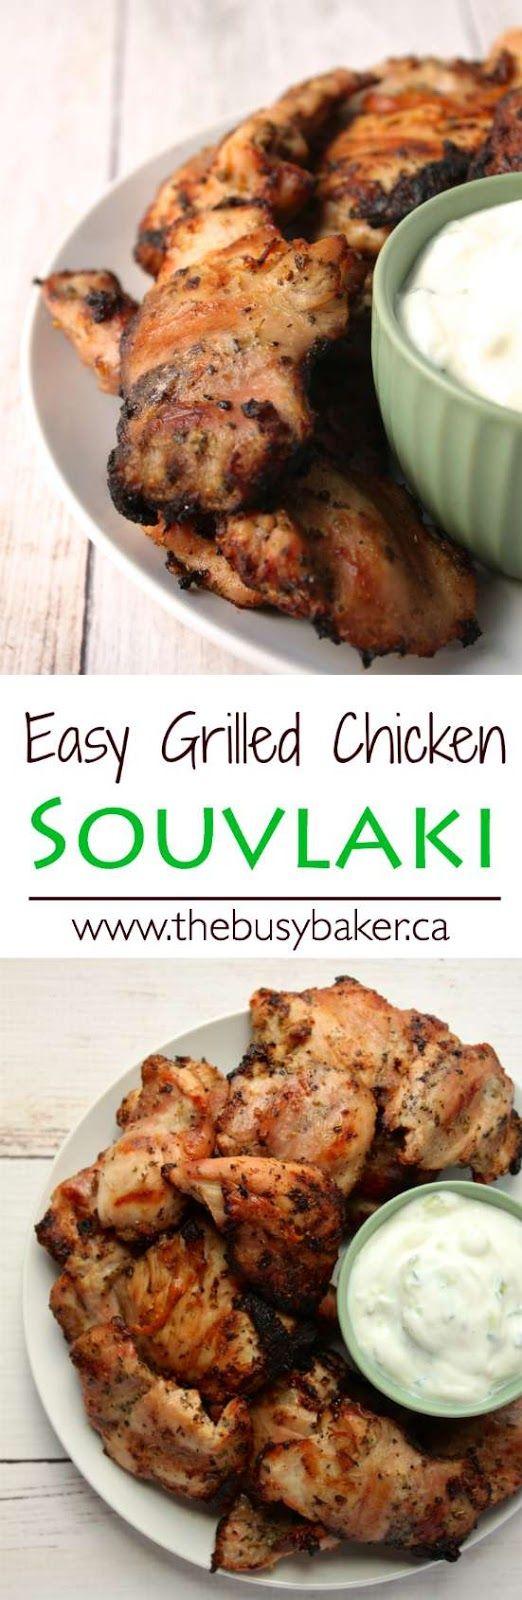 The Busy Baker: Grilled Chicken Souvlaki